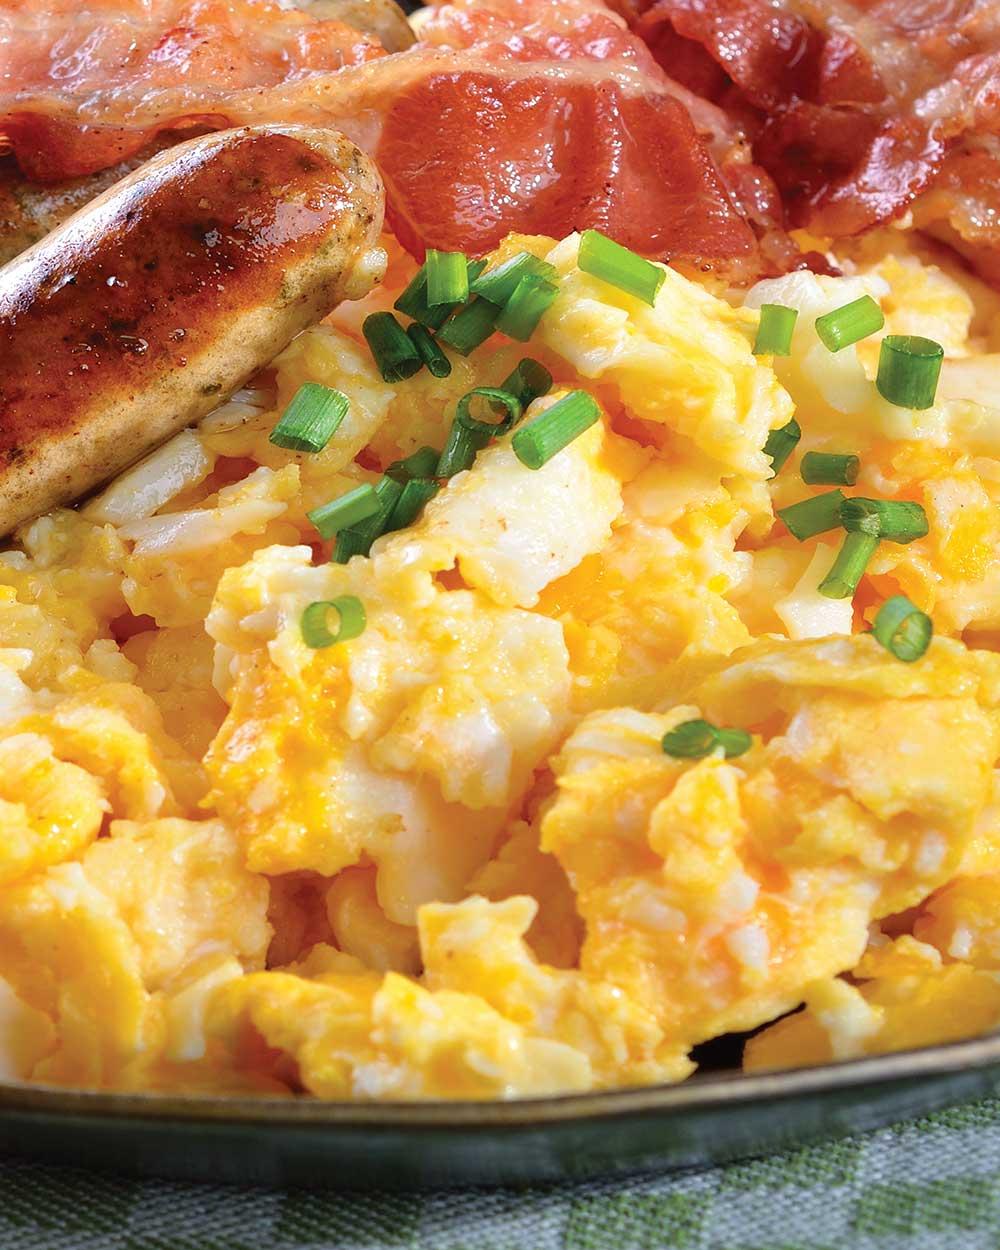 Cheesy Onion & Avocado Scrambled Eggs